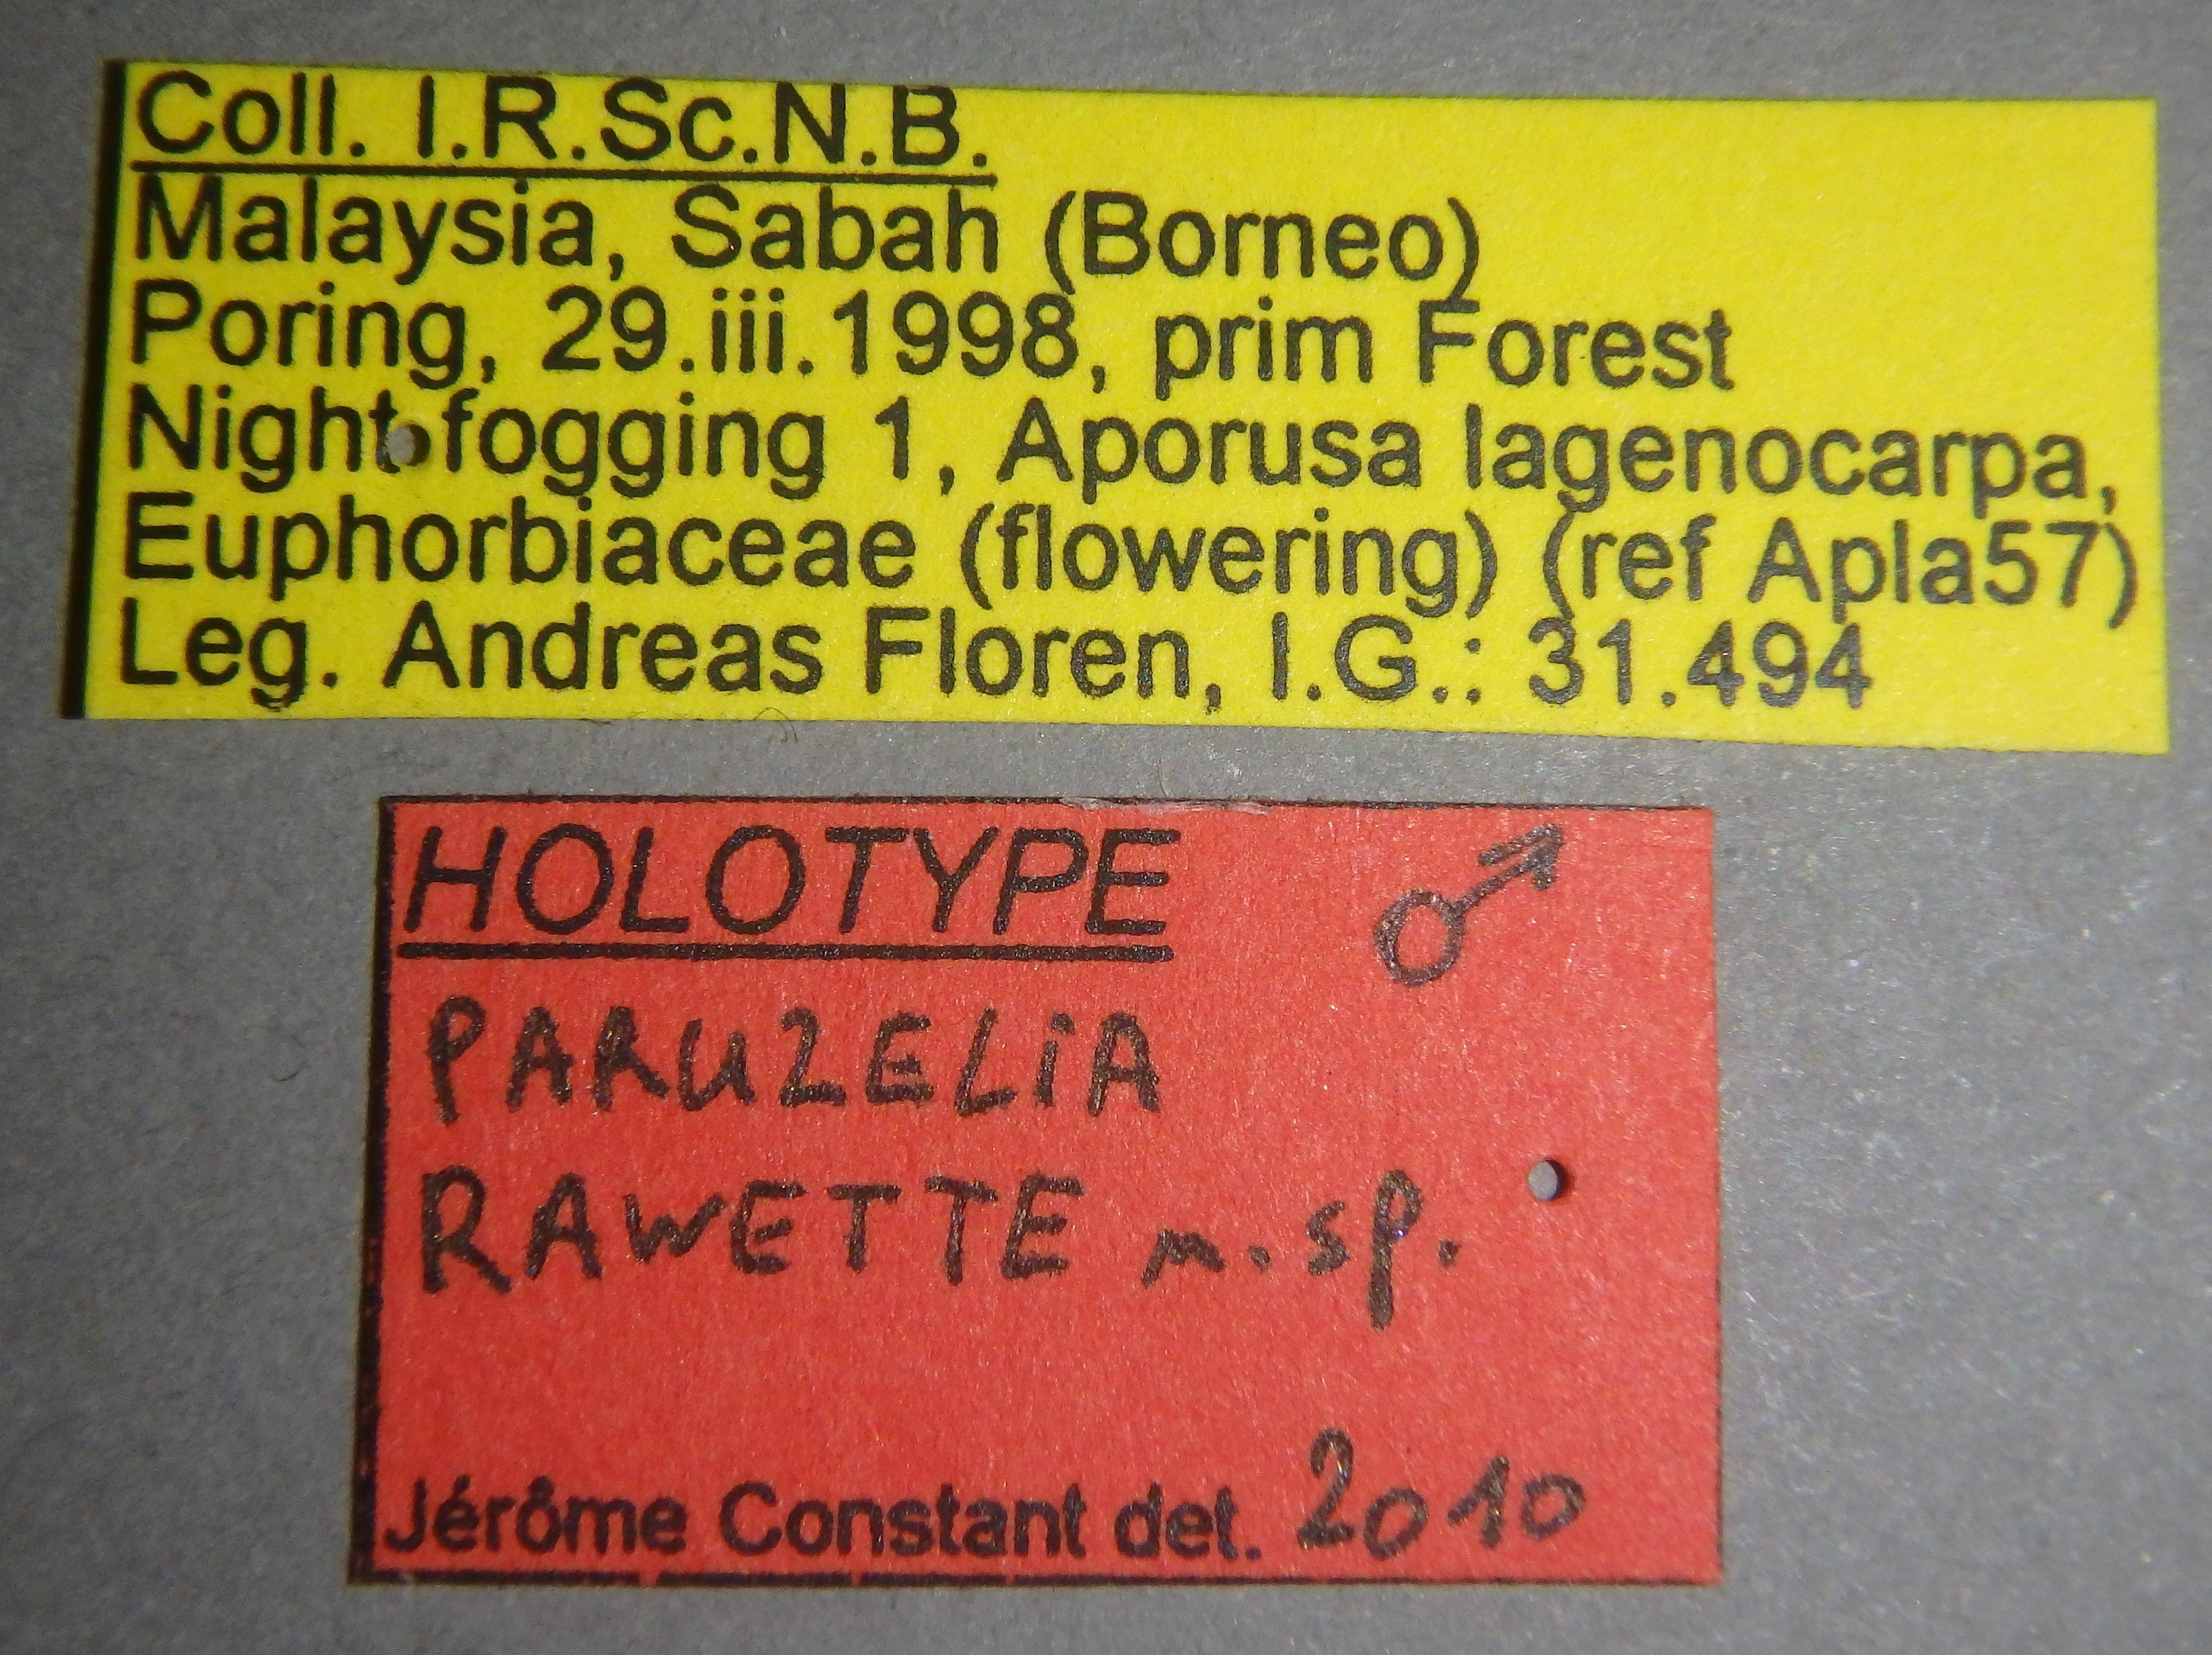 Paruzelia rawette ht Lb.JPG